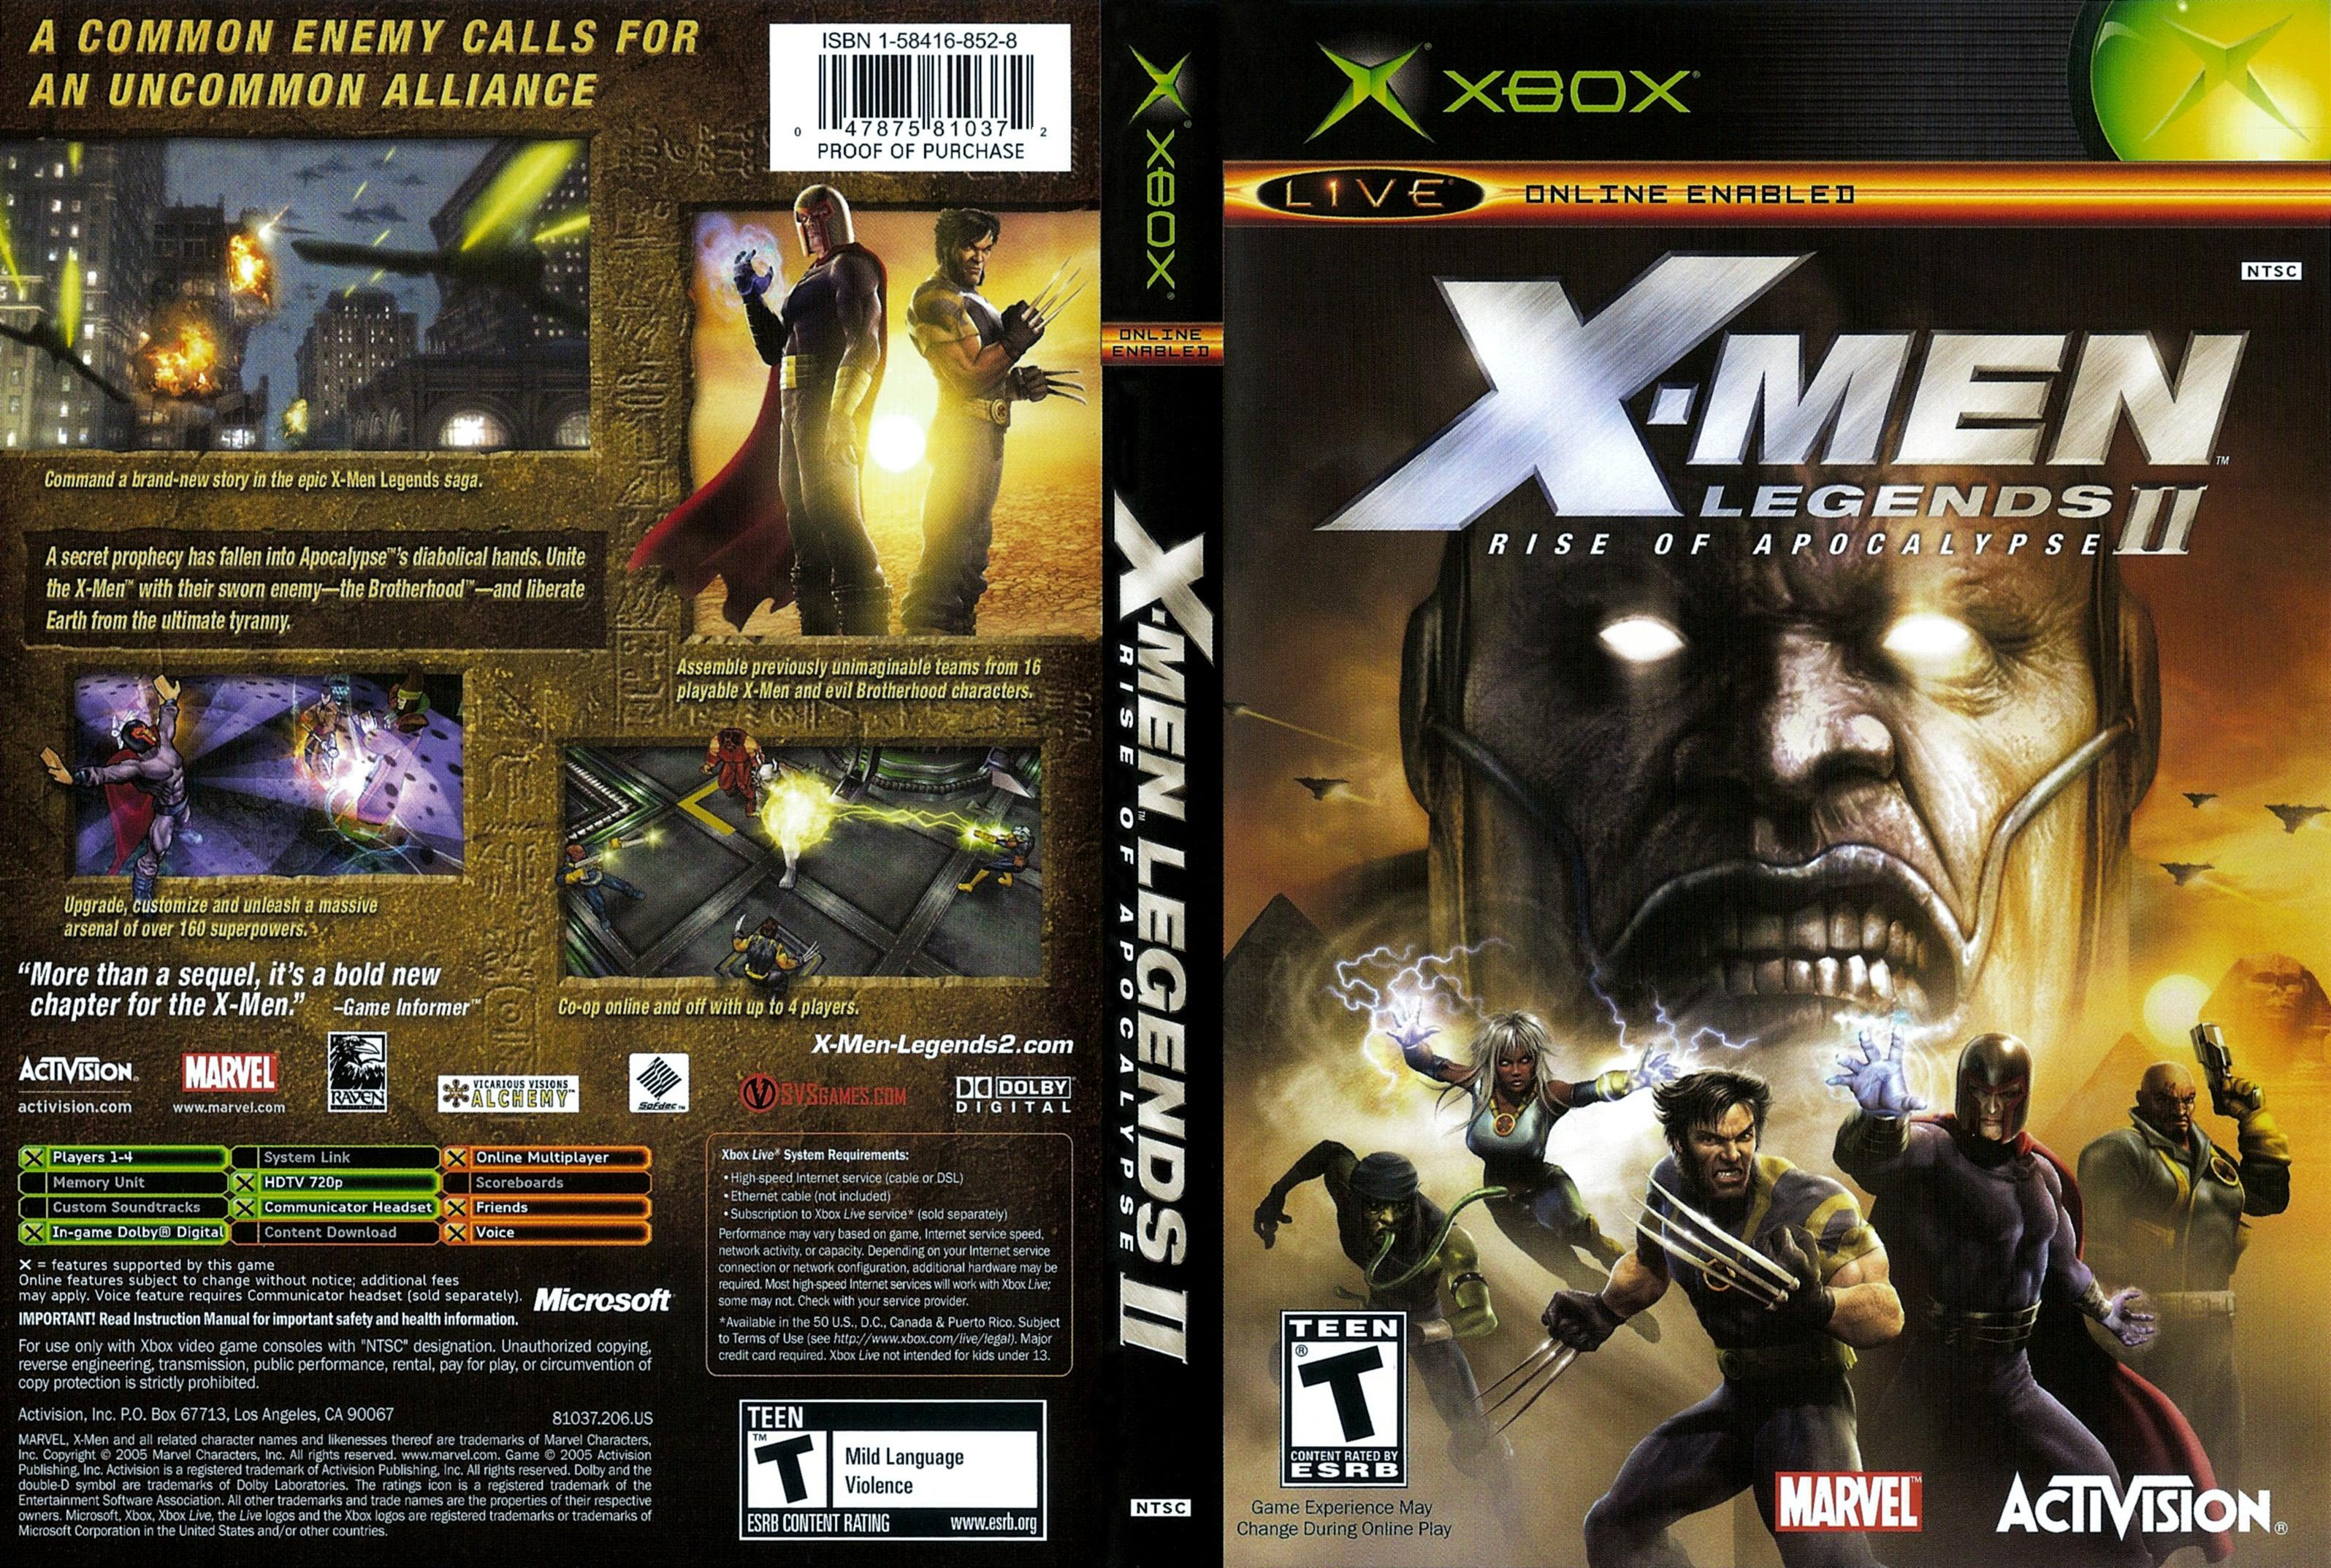 X Men Legends Wallpapers Video Game Hq X Men Legends Pictures 4k Wallpapers 2019